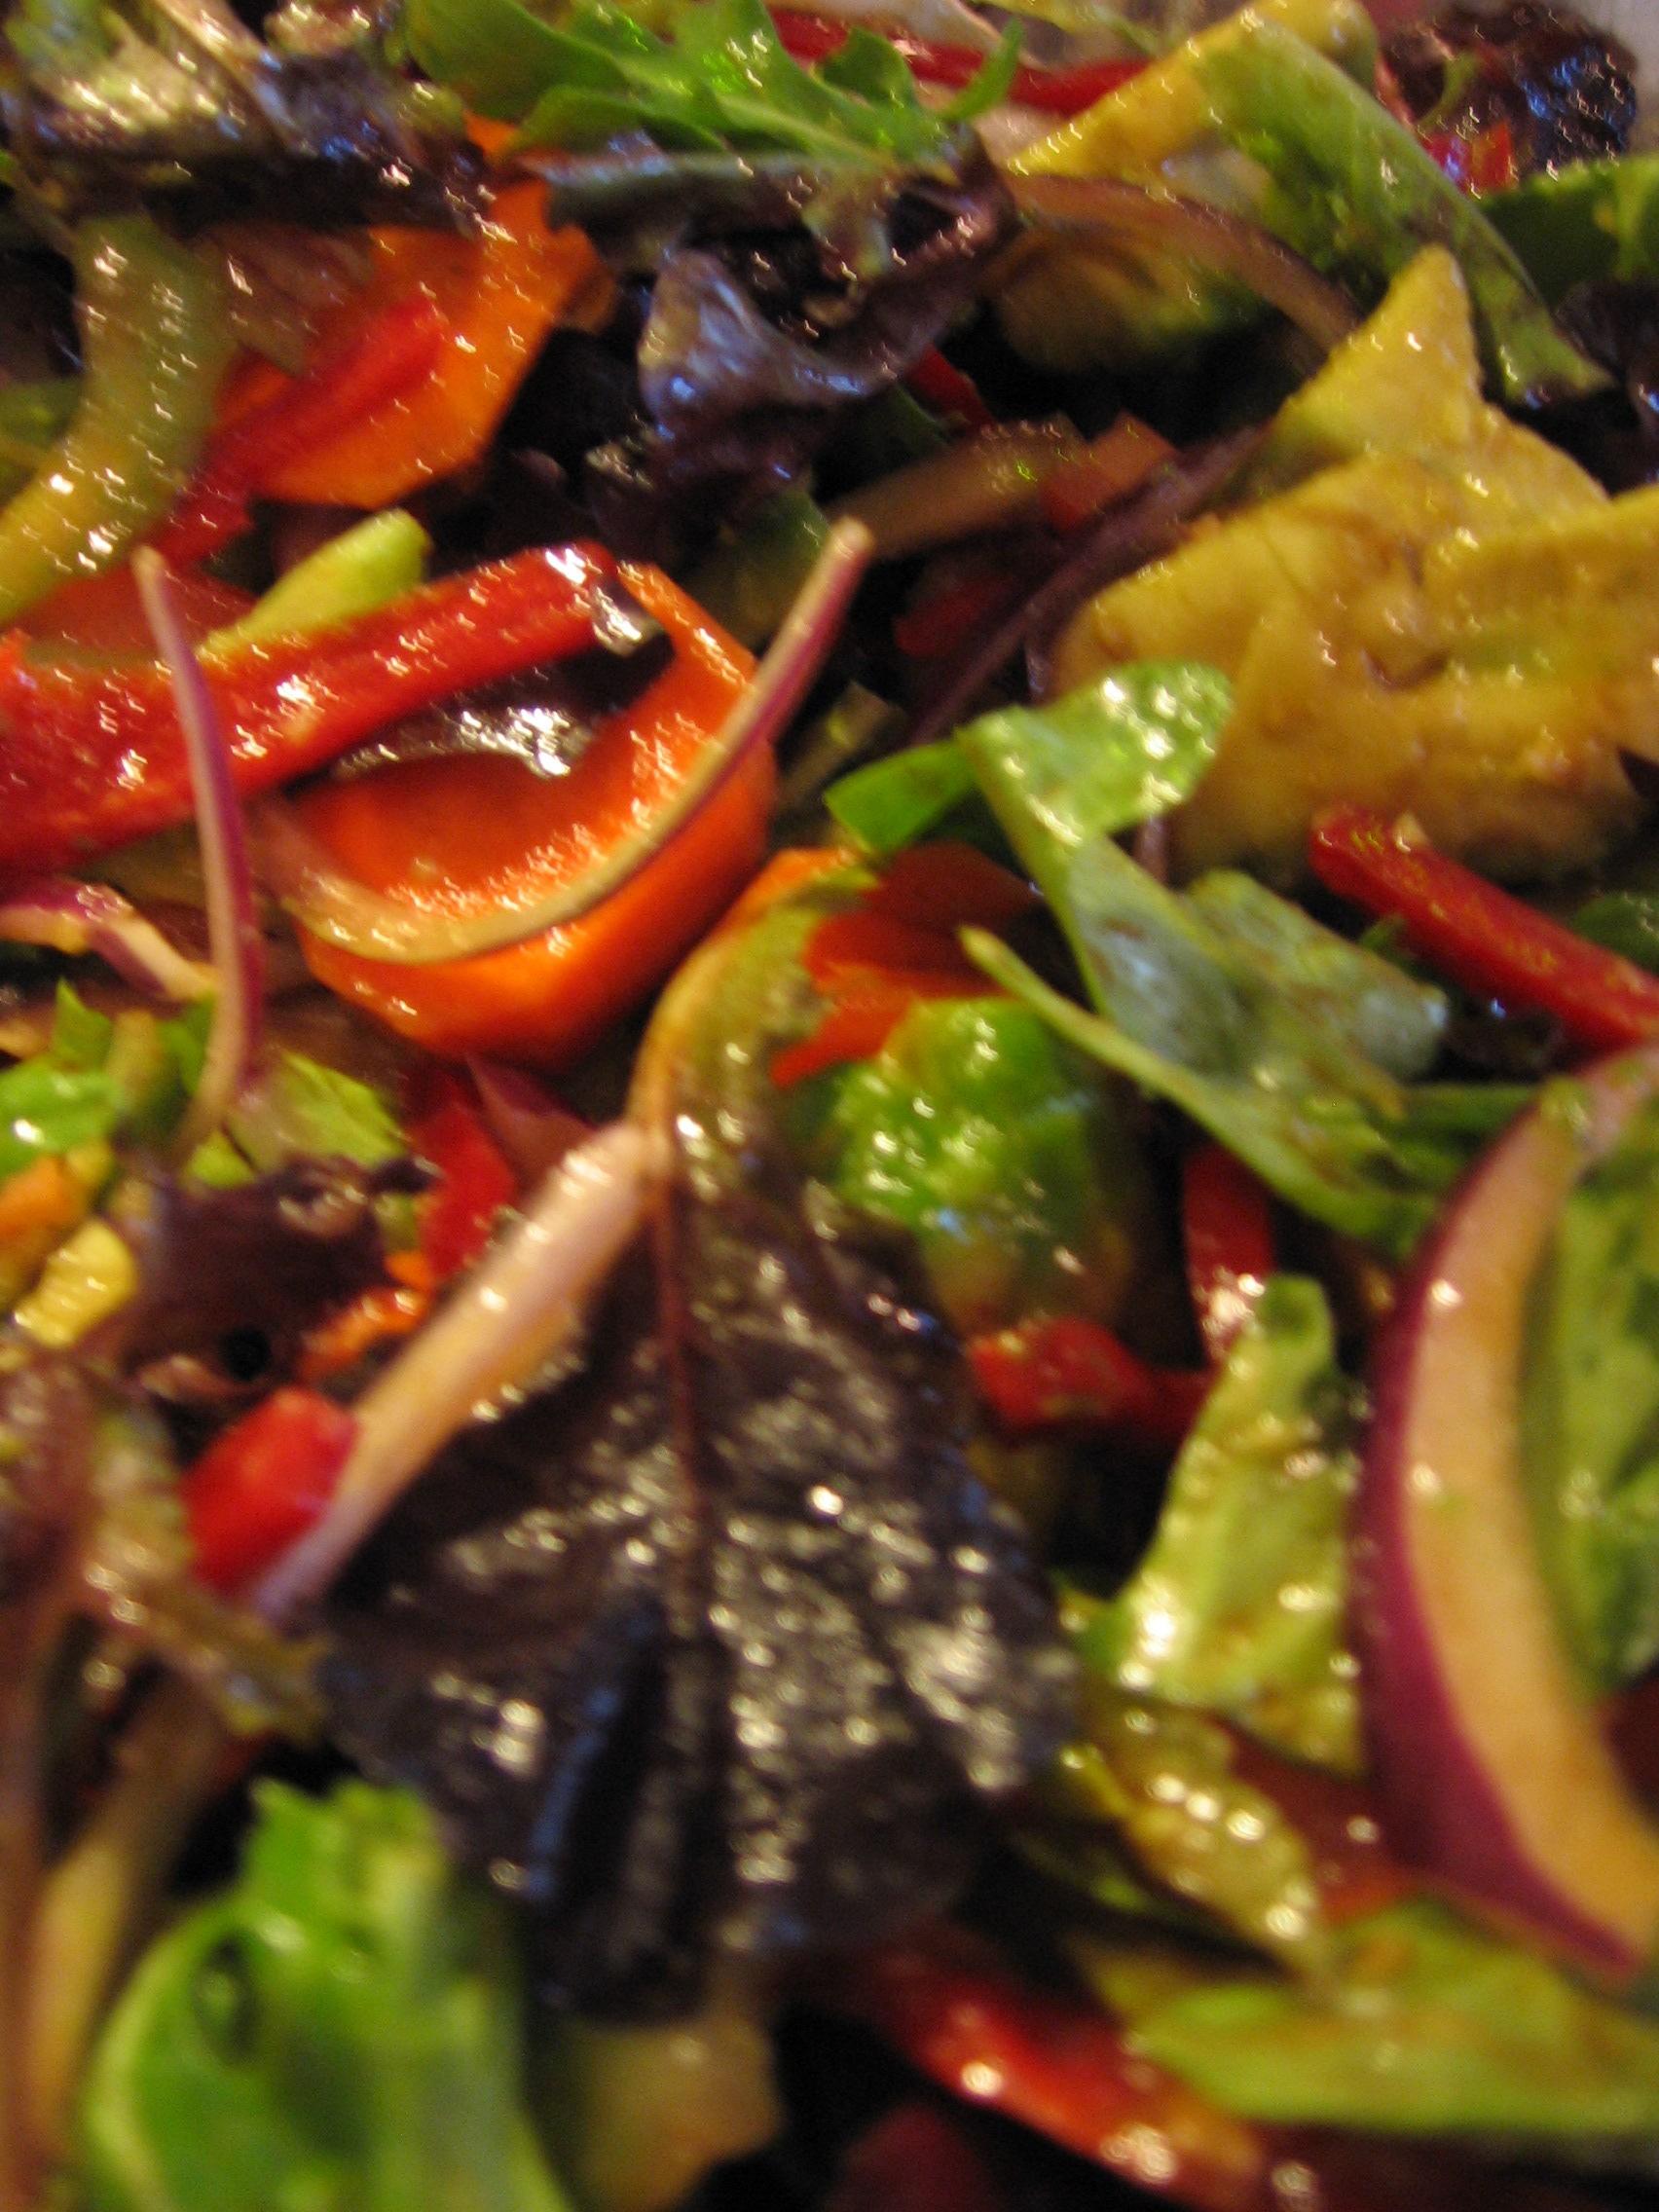 Oil and Vinegar Salad